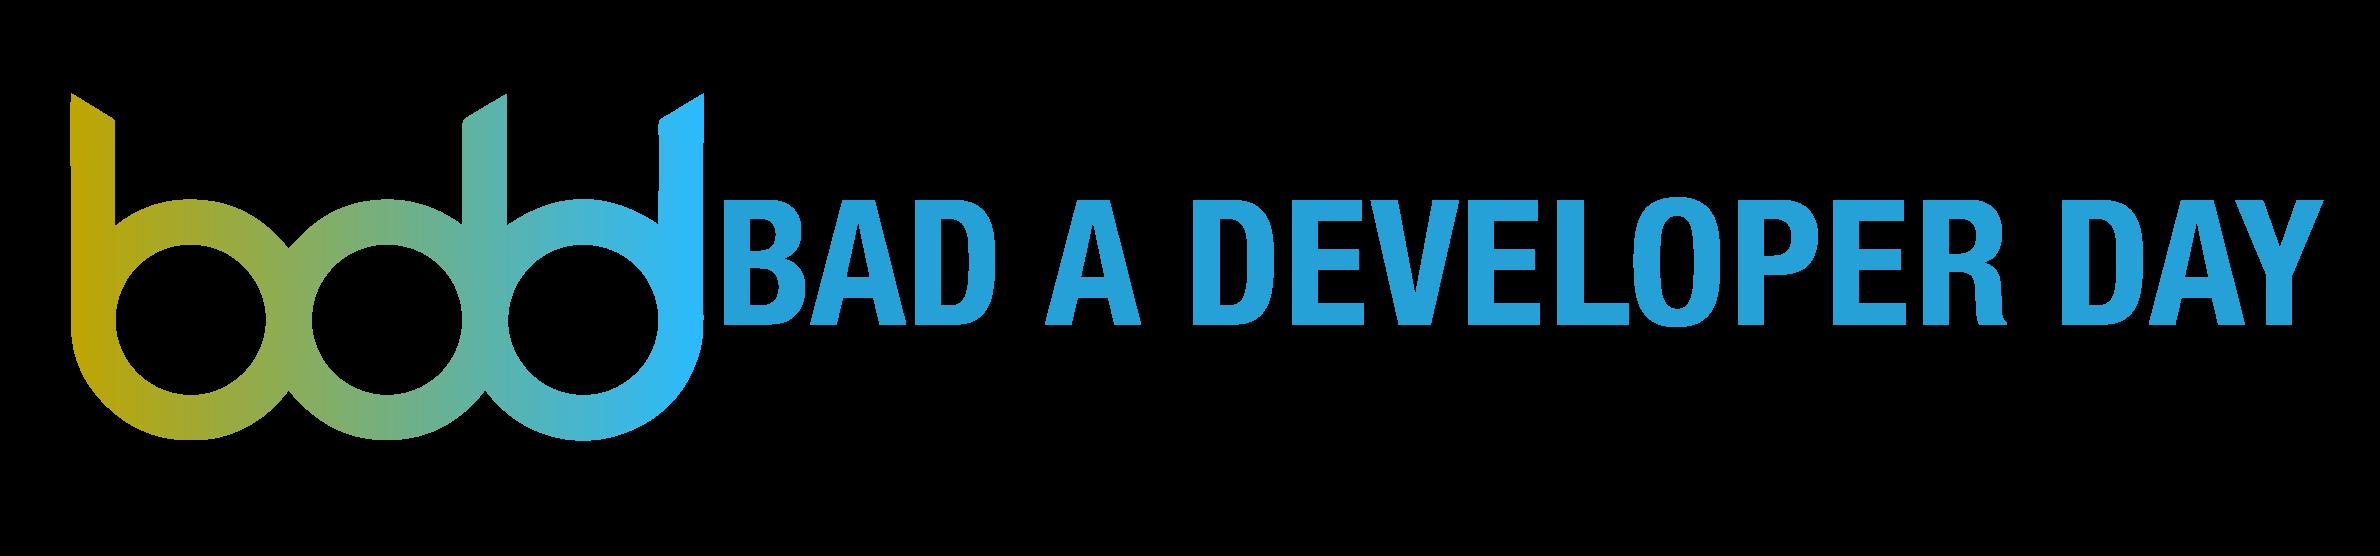 Bad a Developer Day